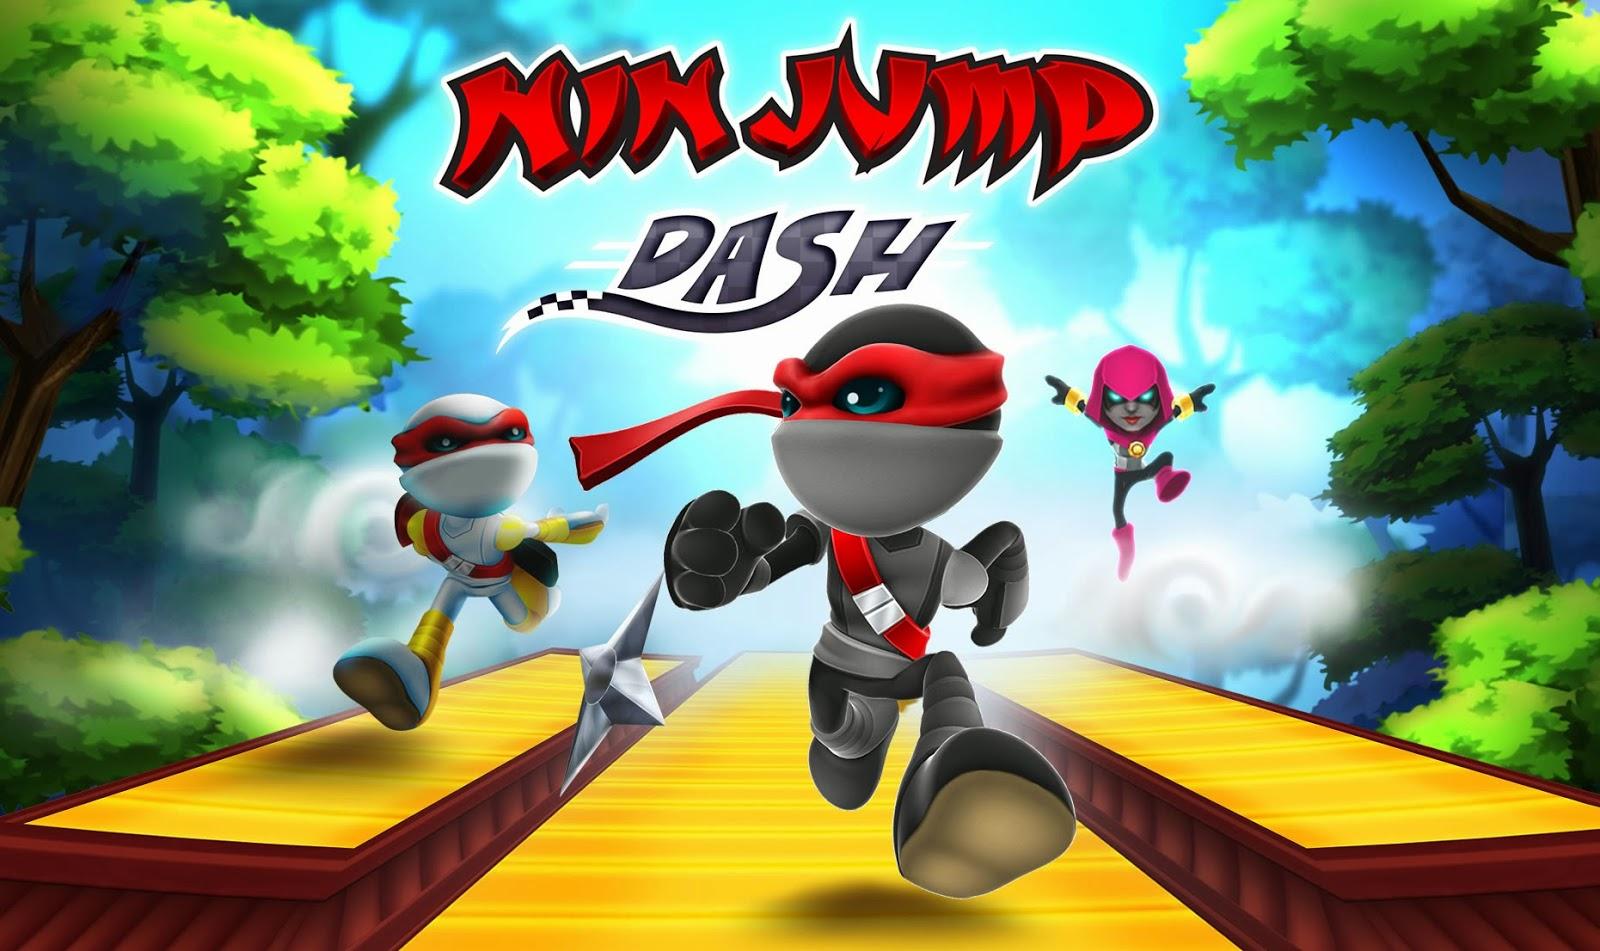 NinJump Dash